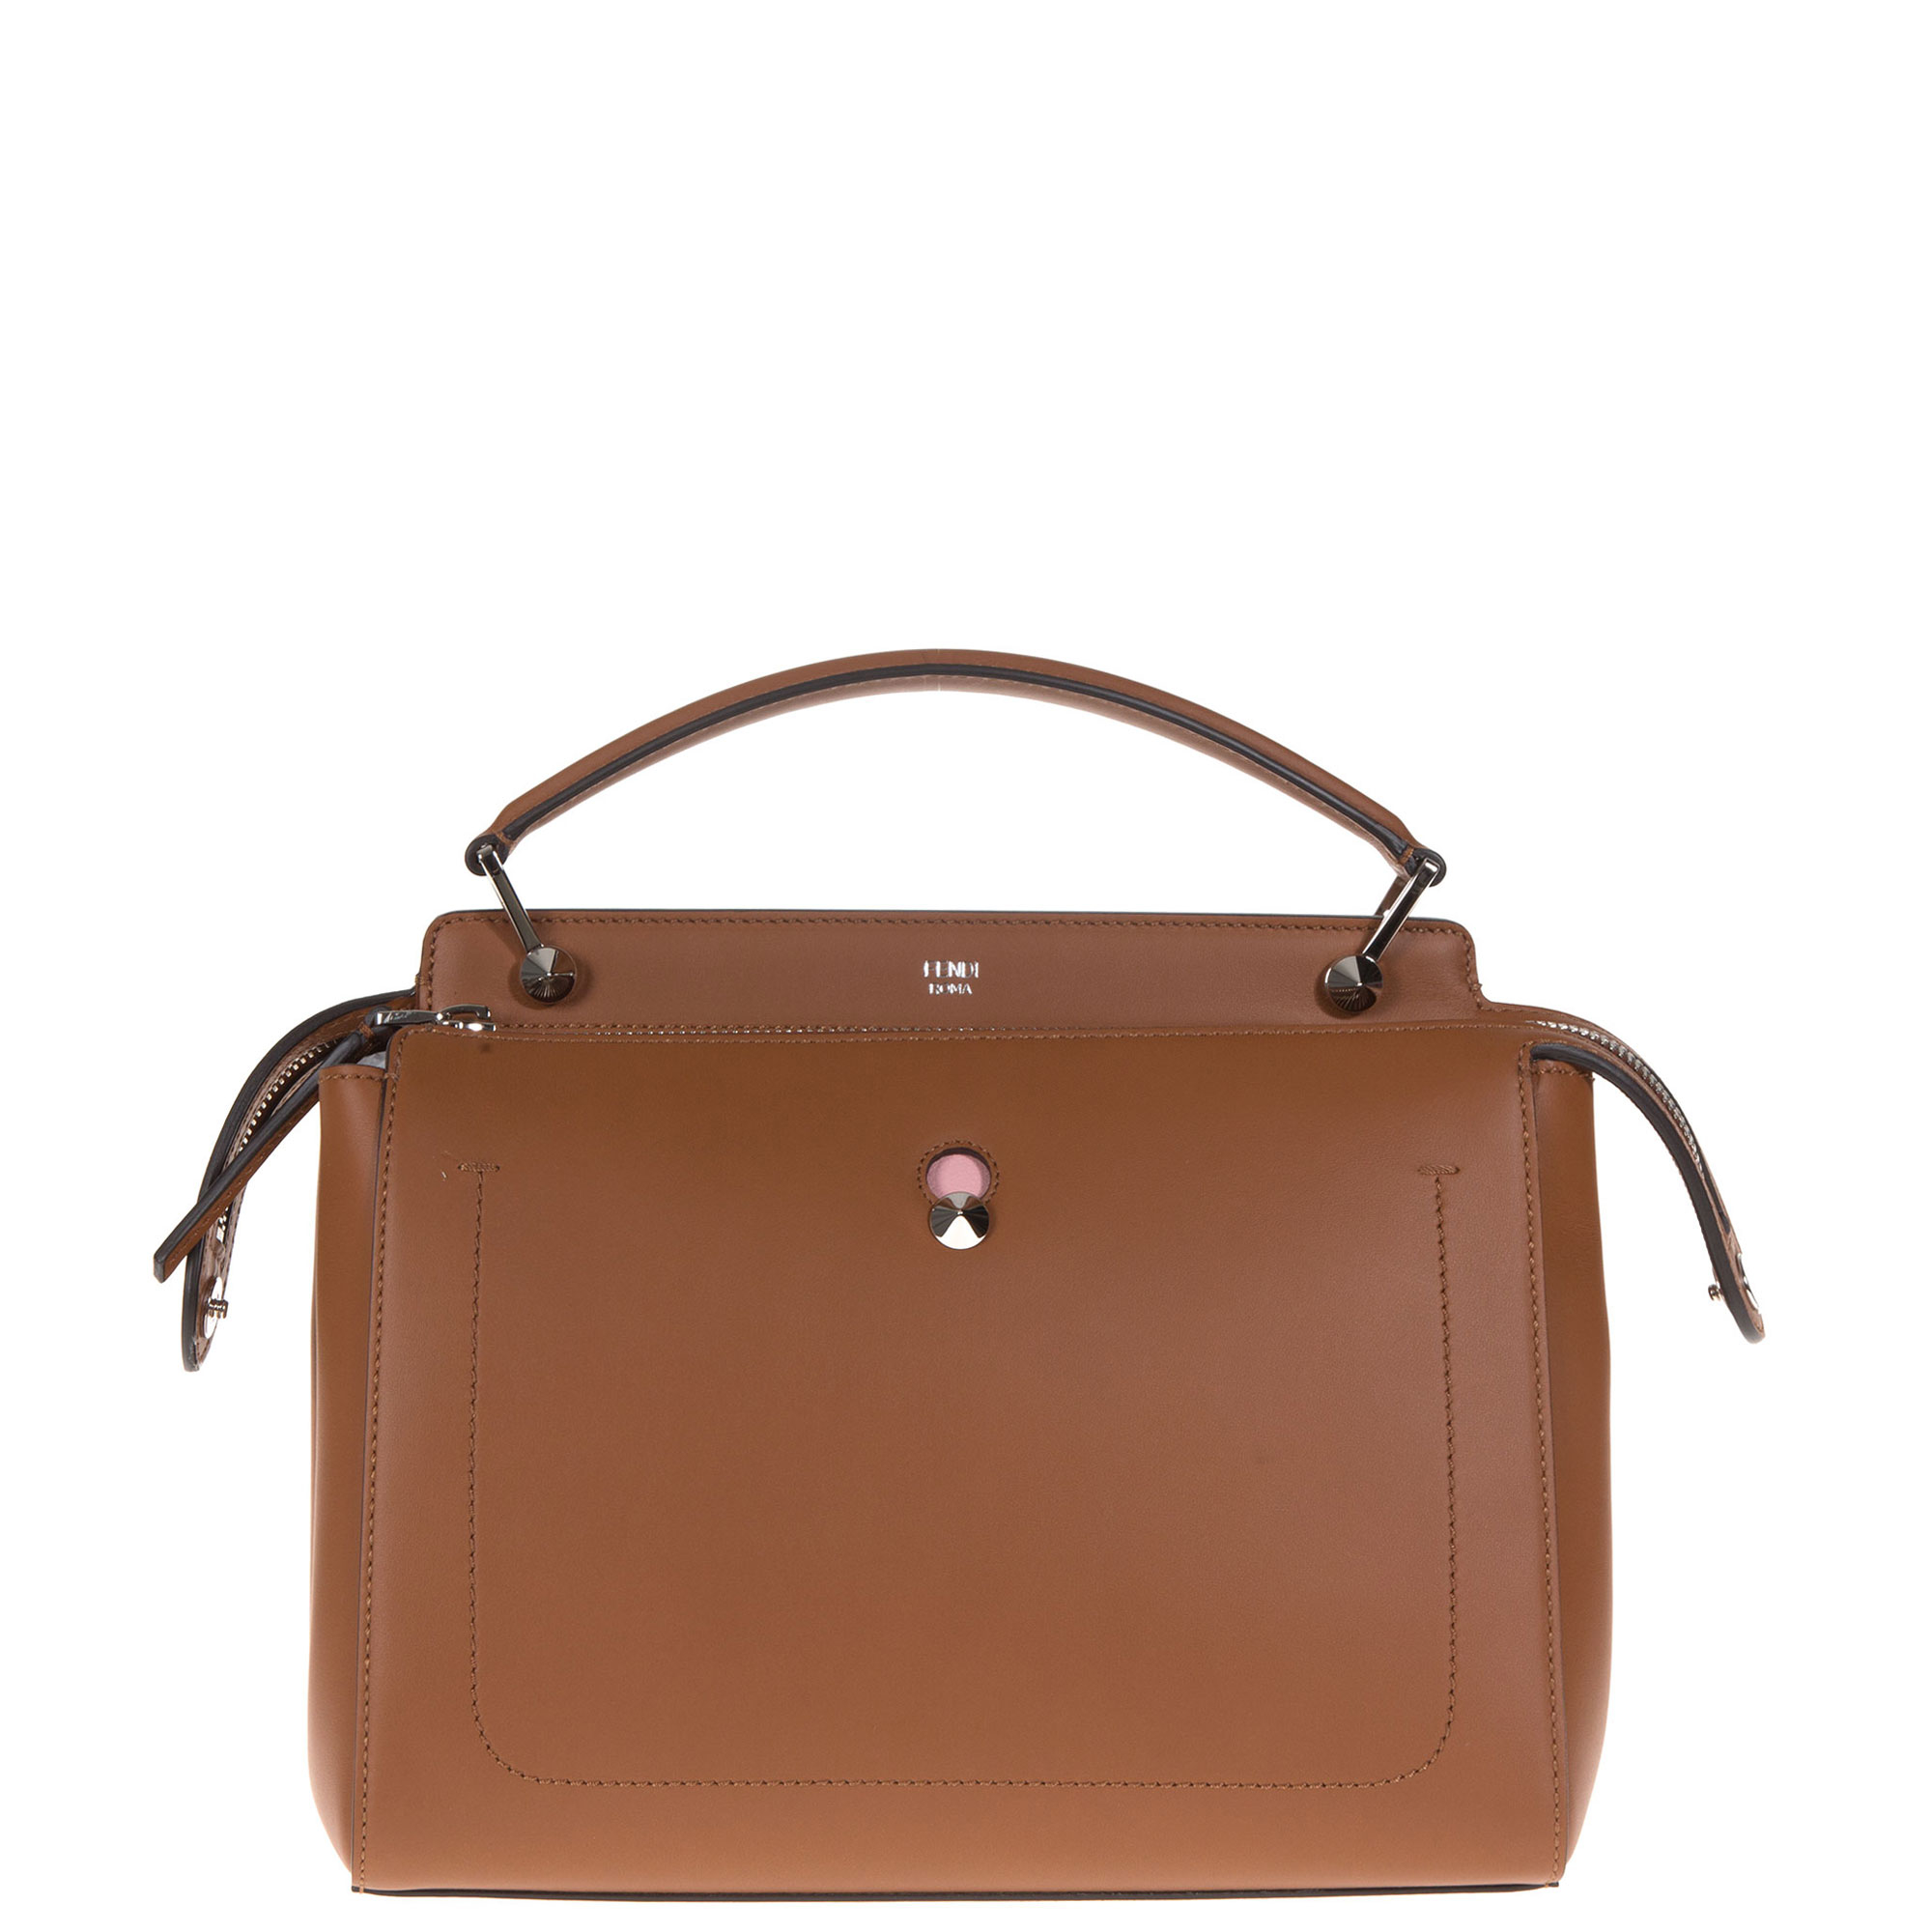 ... shoulder bag 5b2b7 48487 purchase lyst fendi dotcom bag in brown 7620f  def2c ... 96408c2804